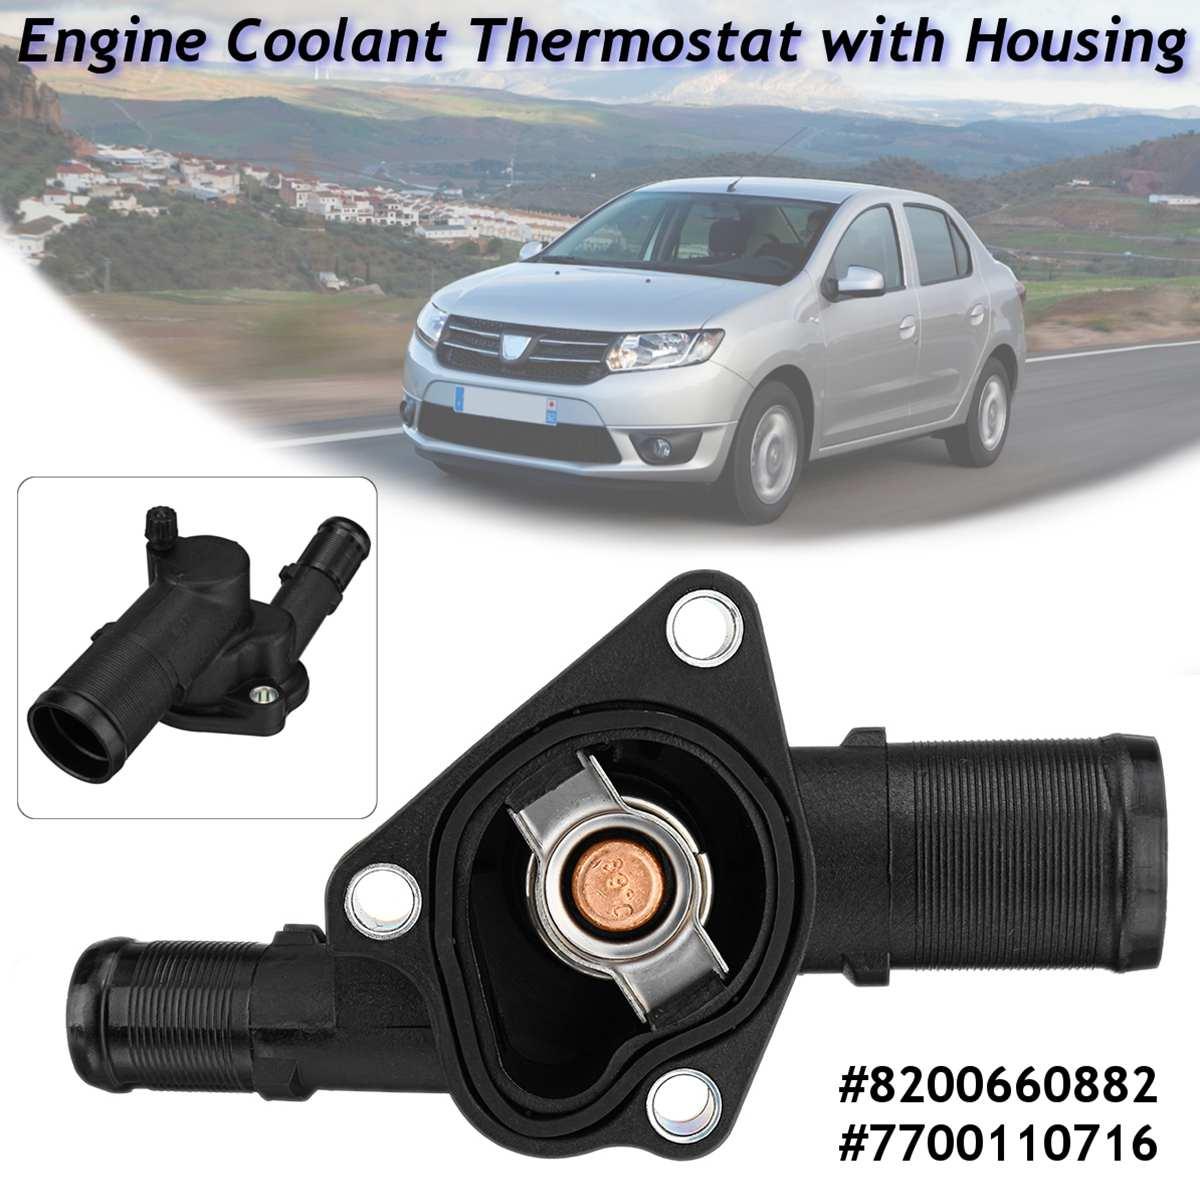 for renault clio kangoo twingo for dacia logan sandero for nissan kubistar 8200660882 engine coolant thermostat [ 1200 x 1200 Pixel ]